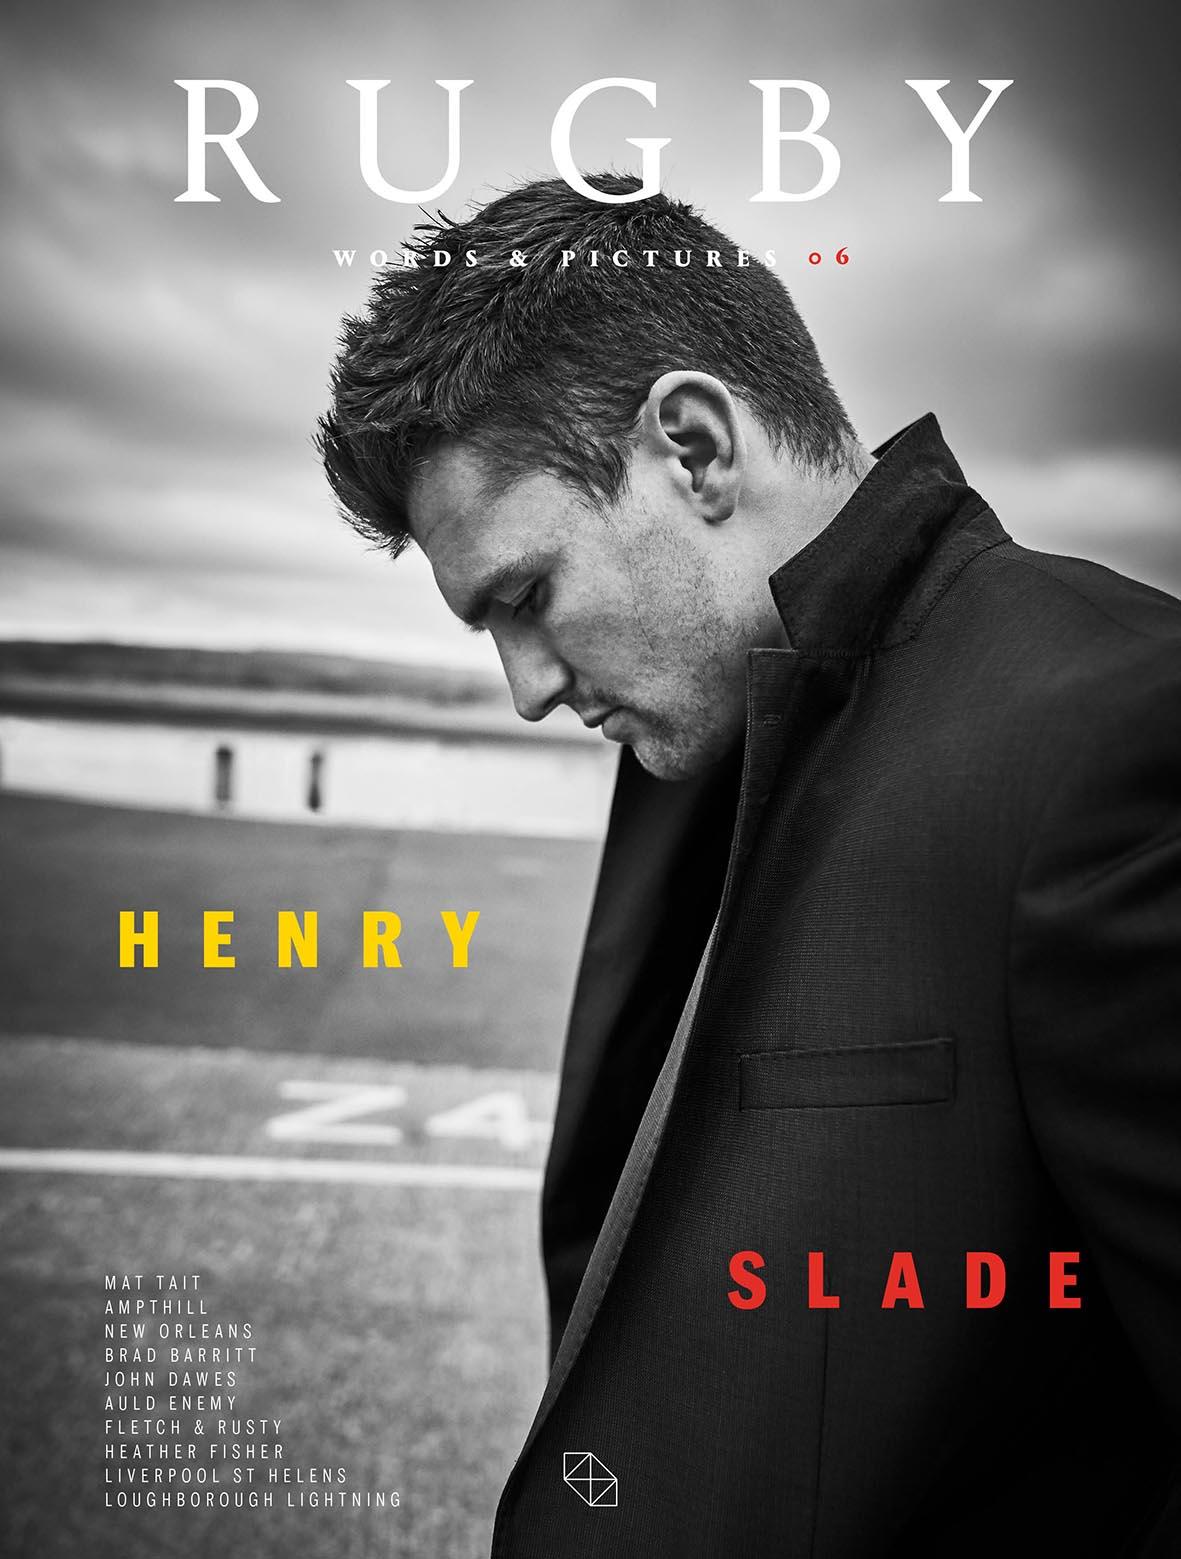 Issue 6 Henry Slade, New Orleans, Loughborough Lightning, Liverpool St Helens, John Dawes, Brad Barritt – Russell Earnshaw & John Fletcher, Heather Fisher, Ampthill, Auld Enemy and more… -